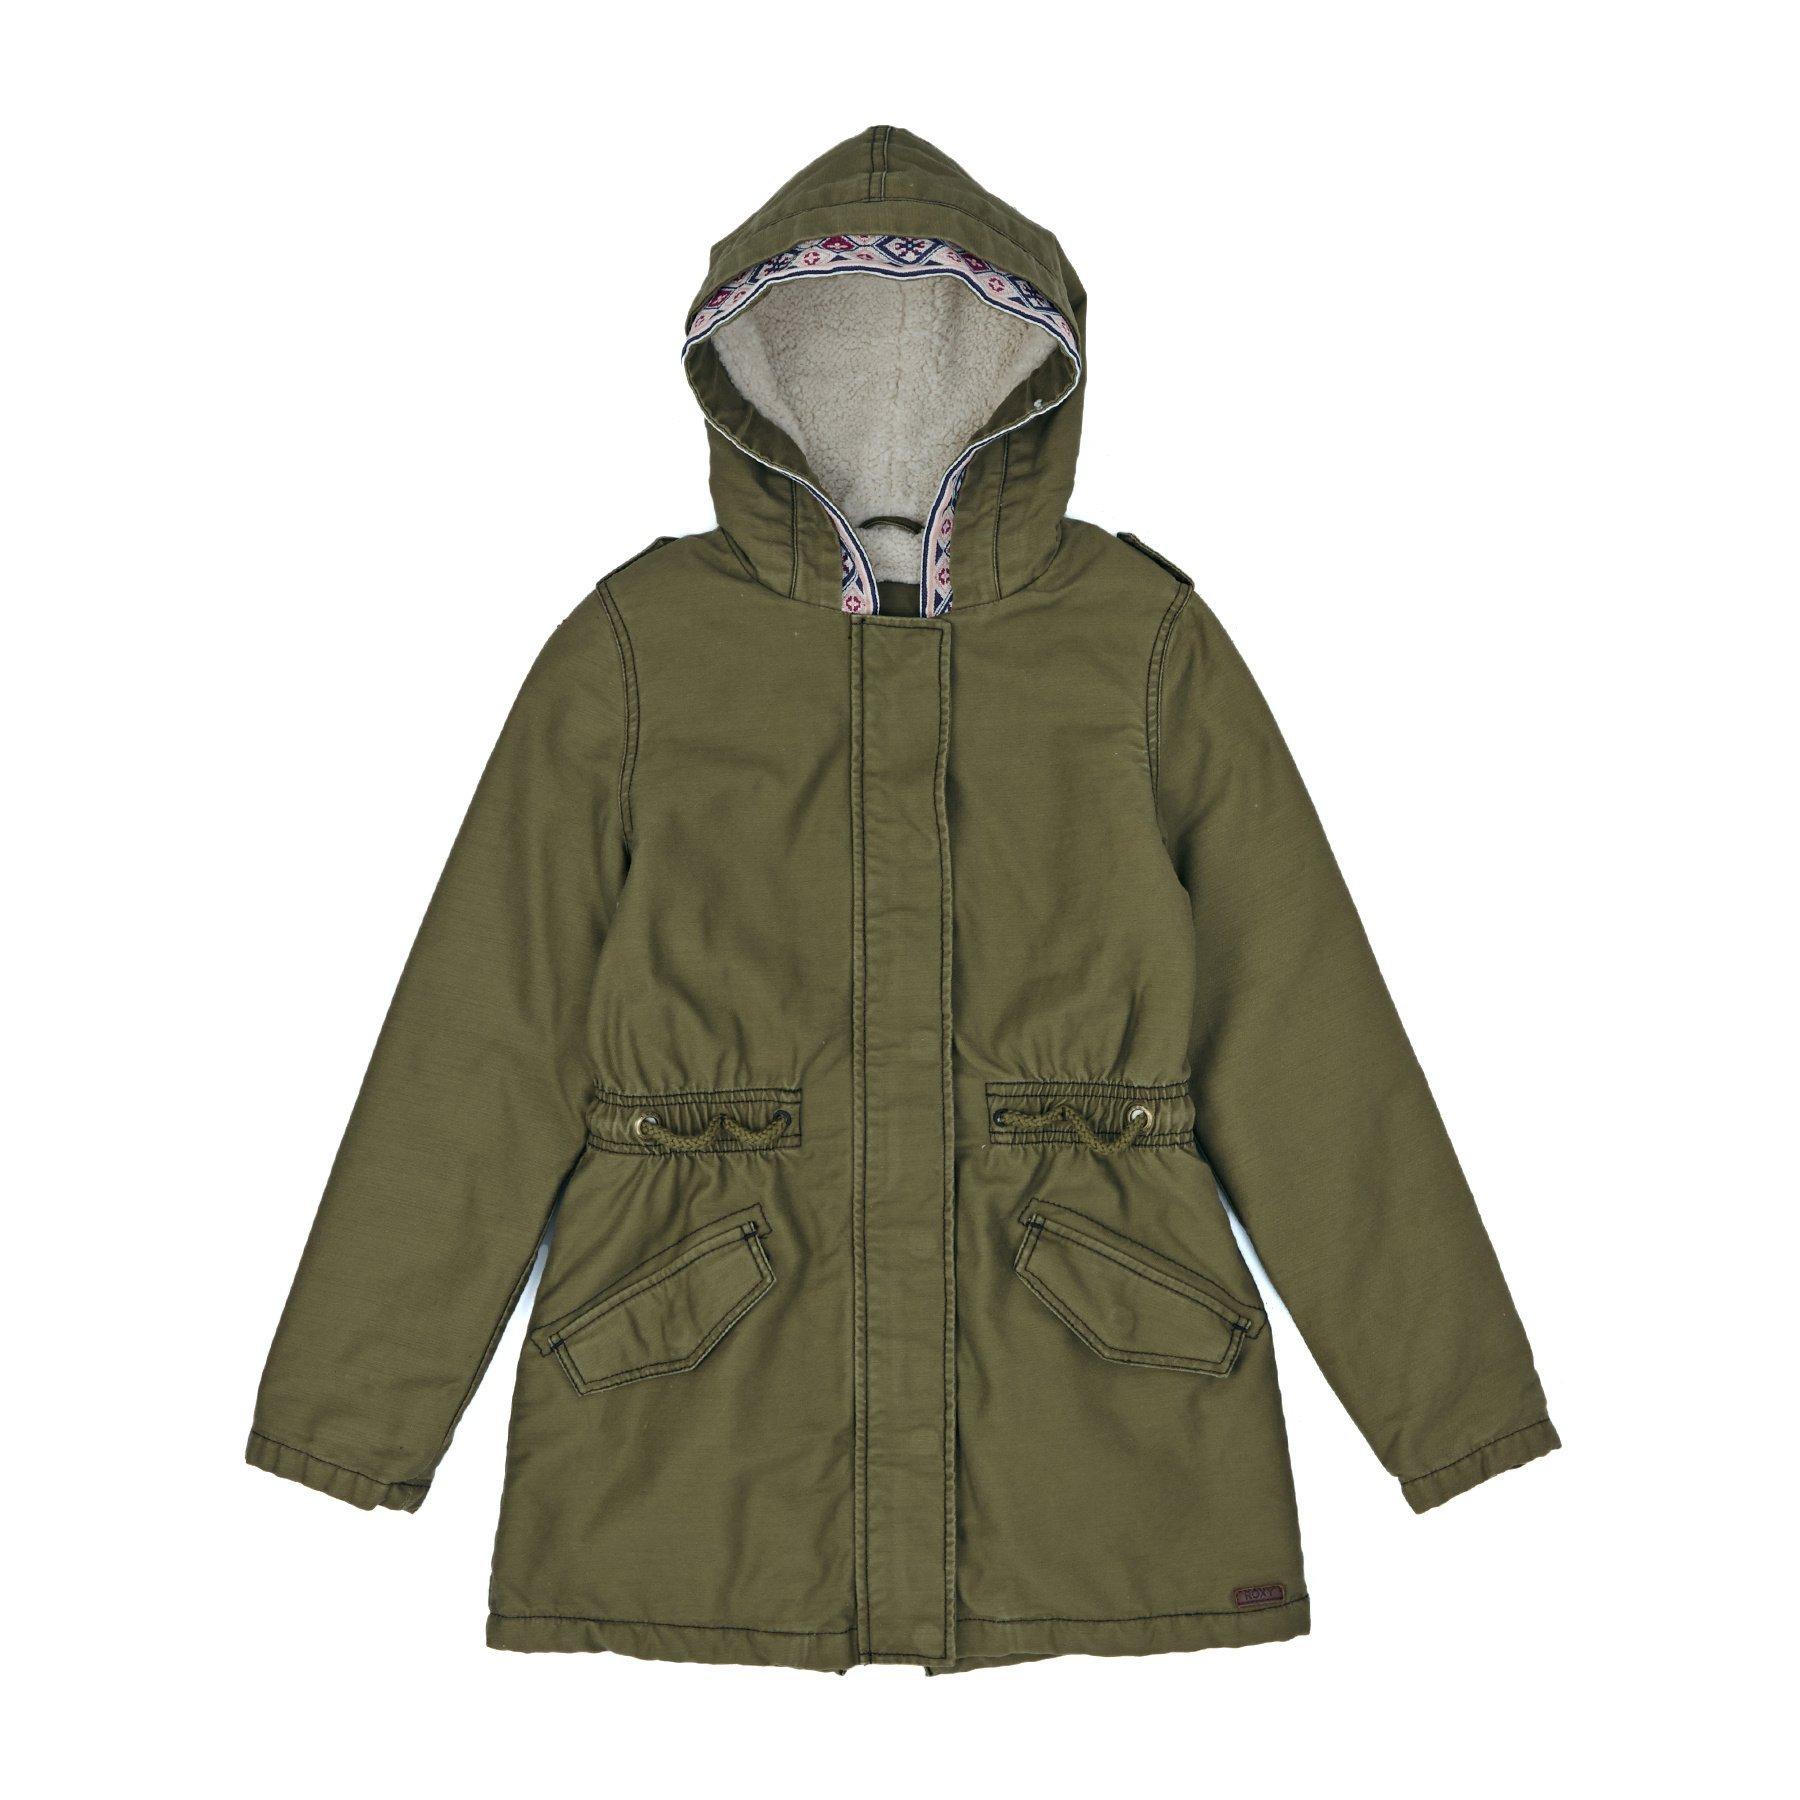 Roxy Jackets - Roxy Summer Storm Sherpa Lined Parka Jacket - Military Olive